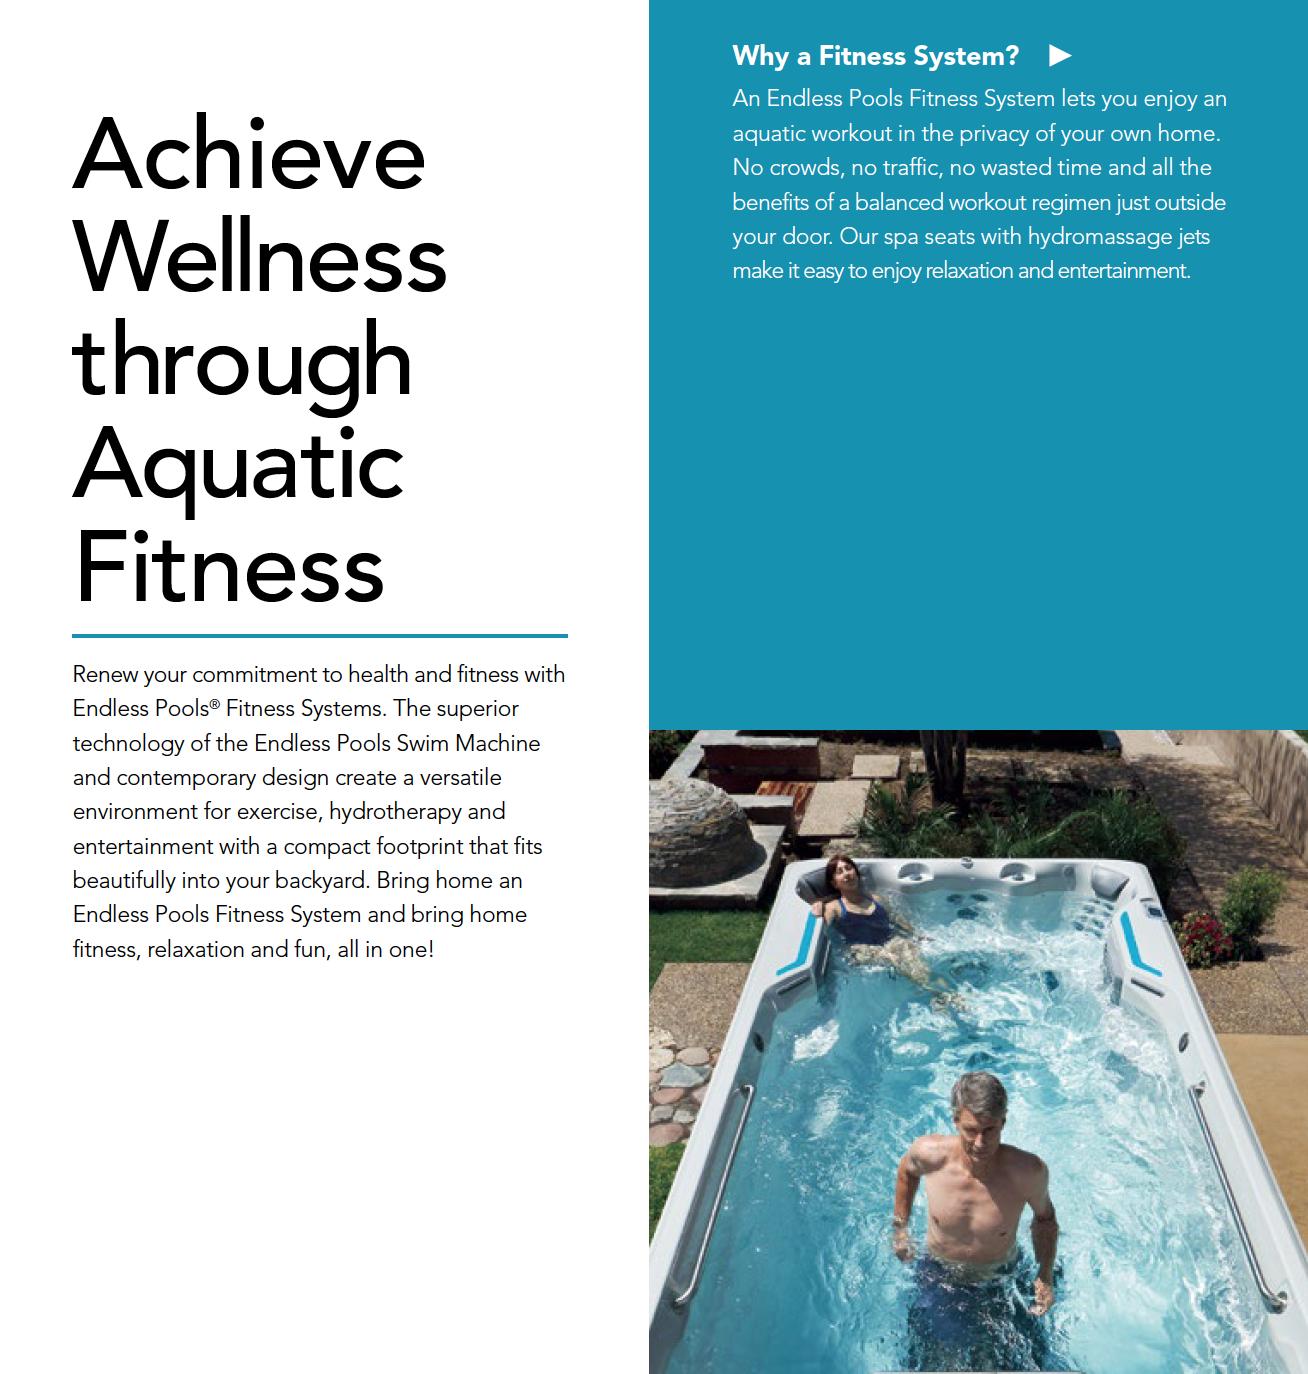 swim-spa-nz-endless-pools-2020-04-18-at-9.55.06-am-20.png